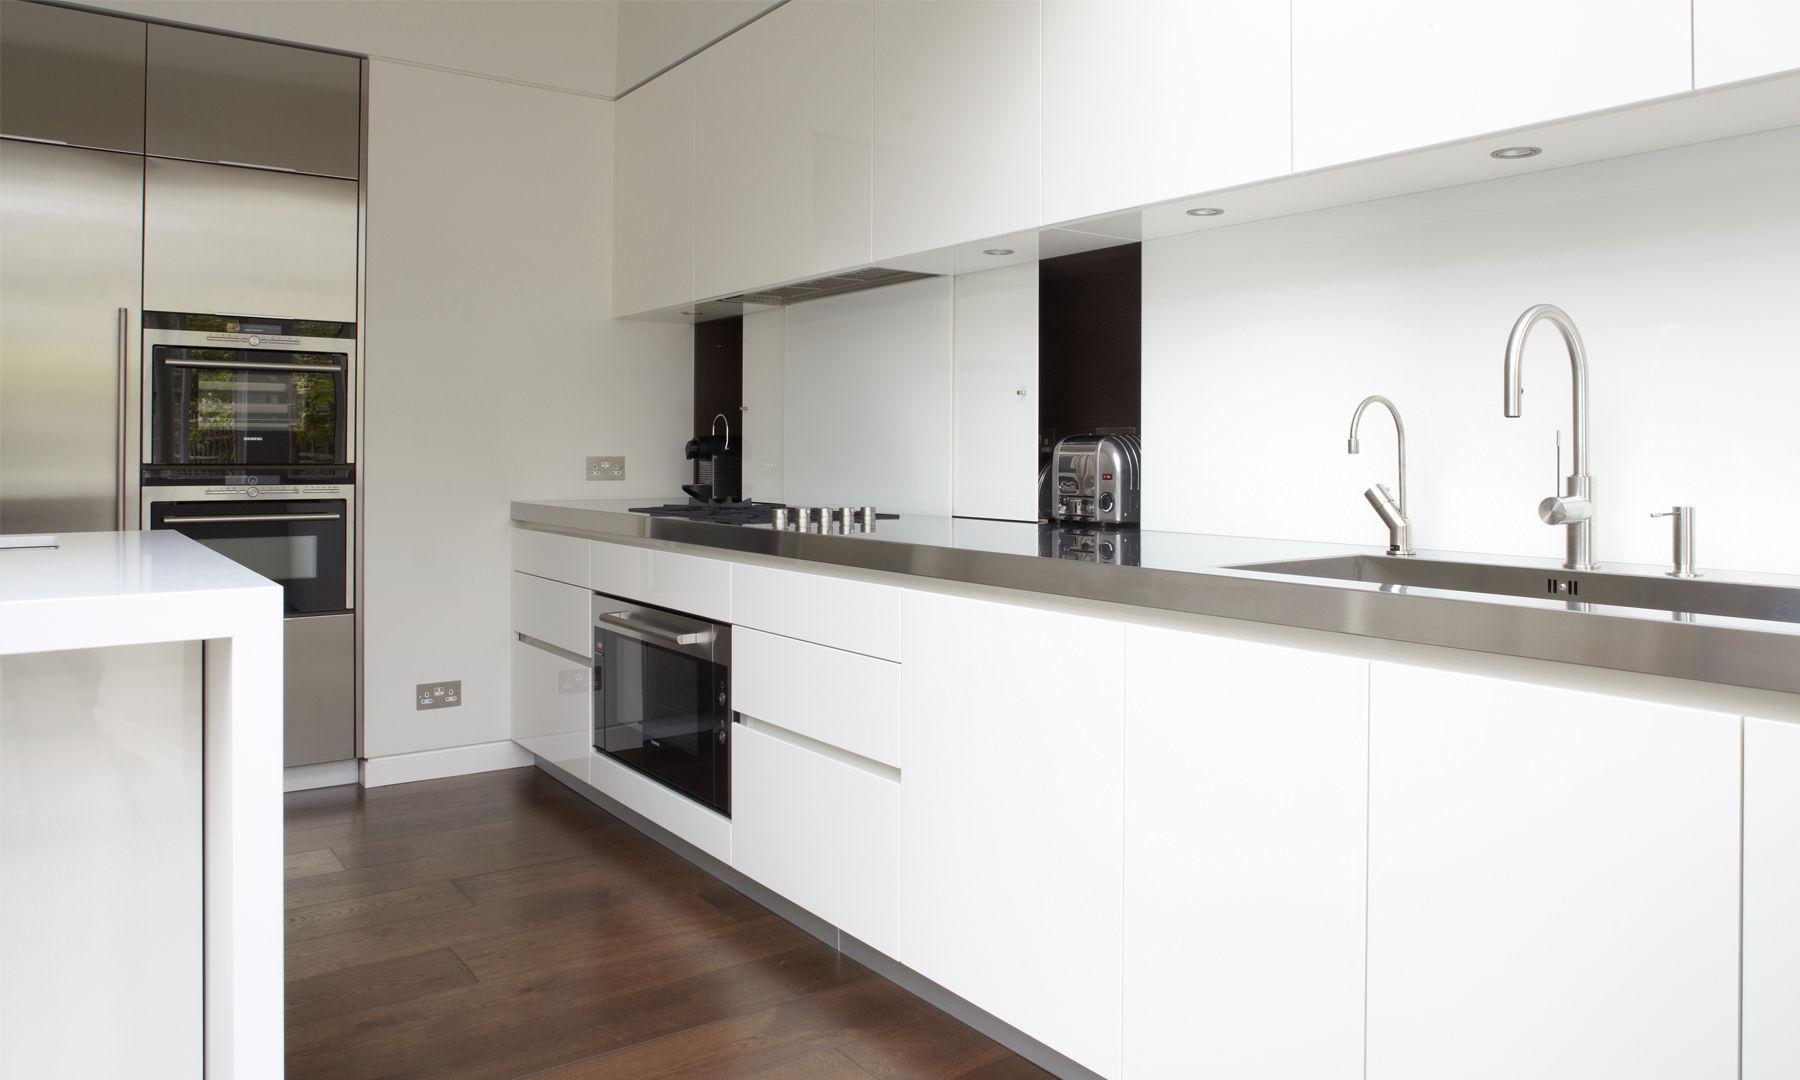 Moderne Küche / Edelstahl / Laminat / Kochinsel - FULHAM - robert ...